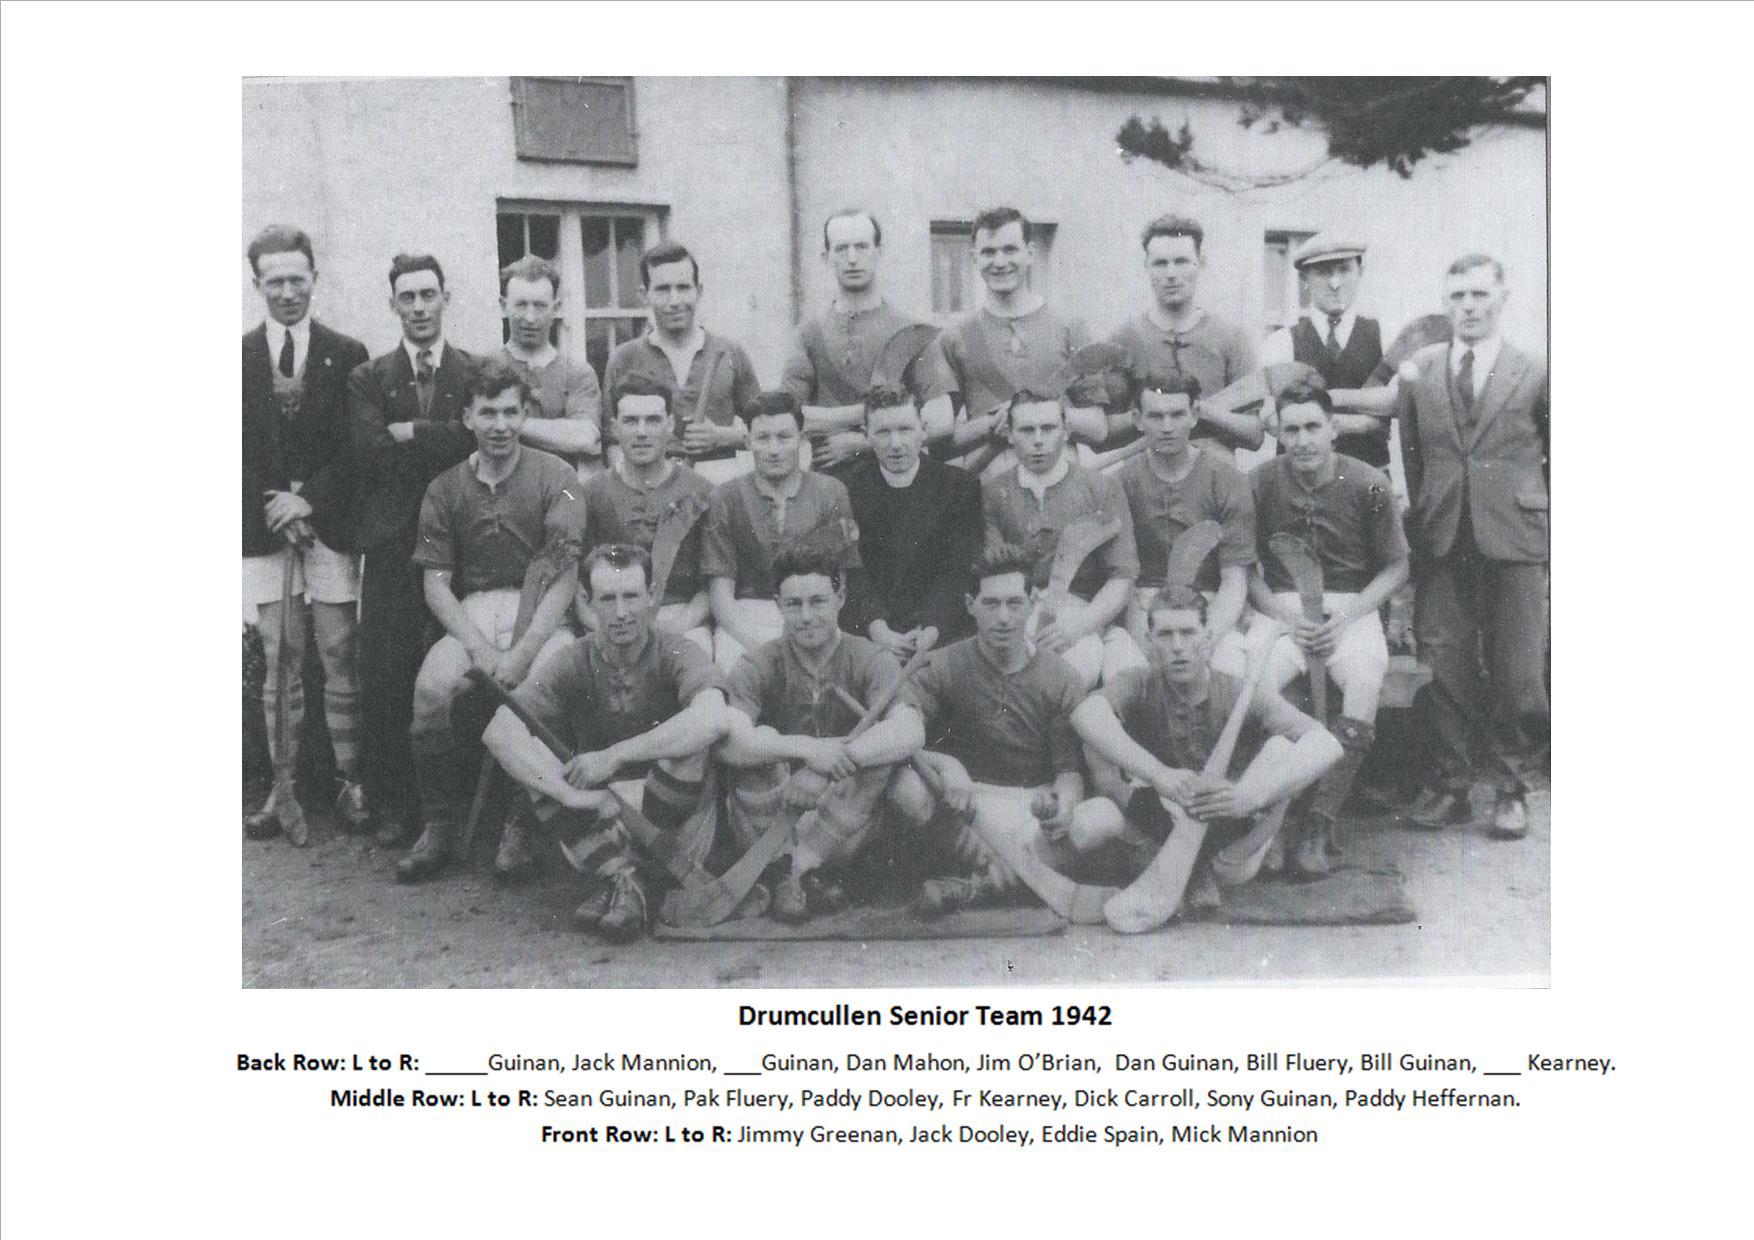 Drumcullen Senior Team - 1942